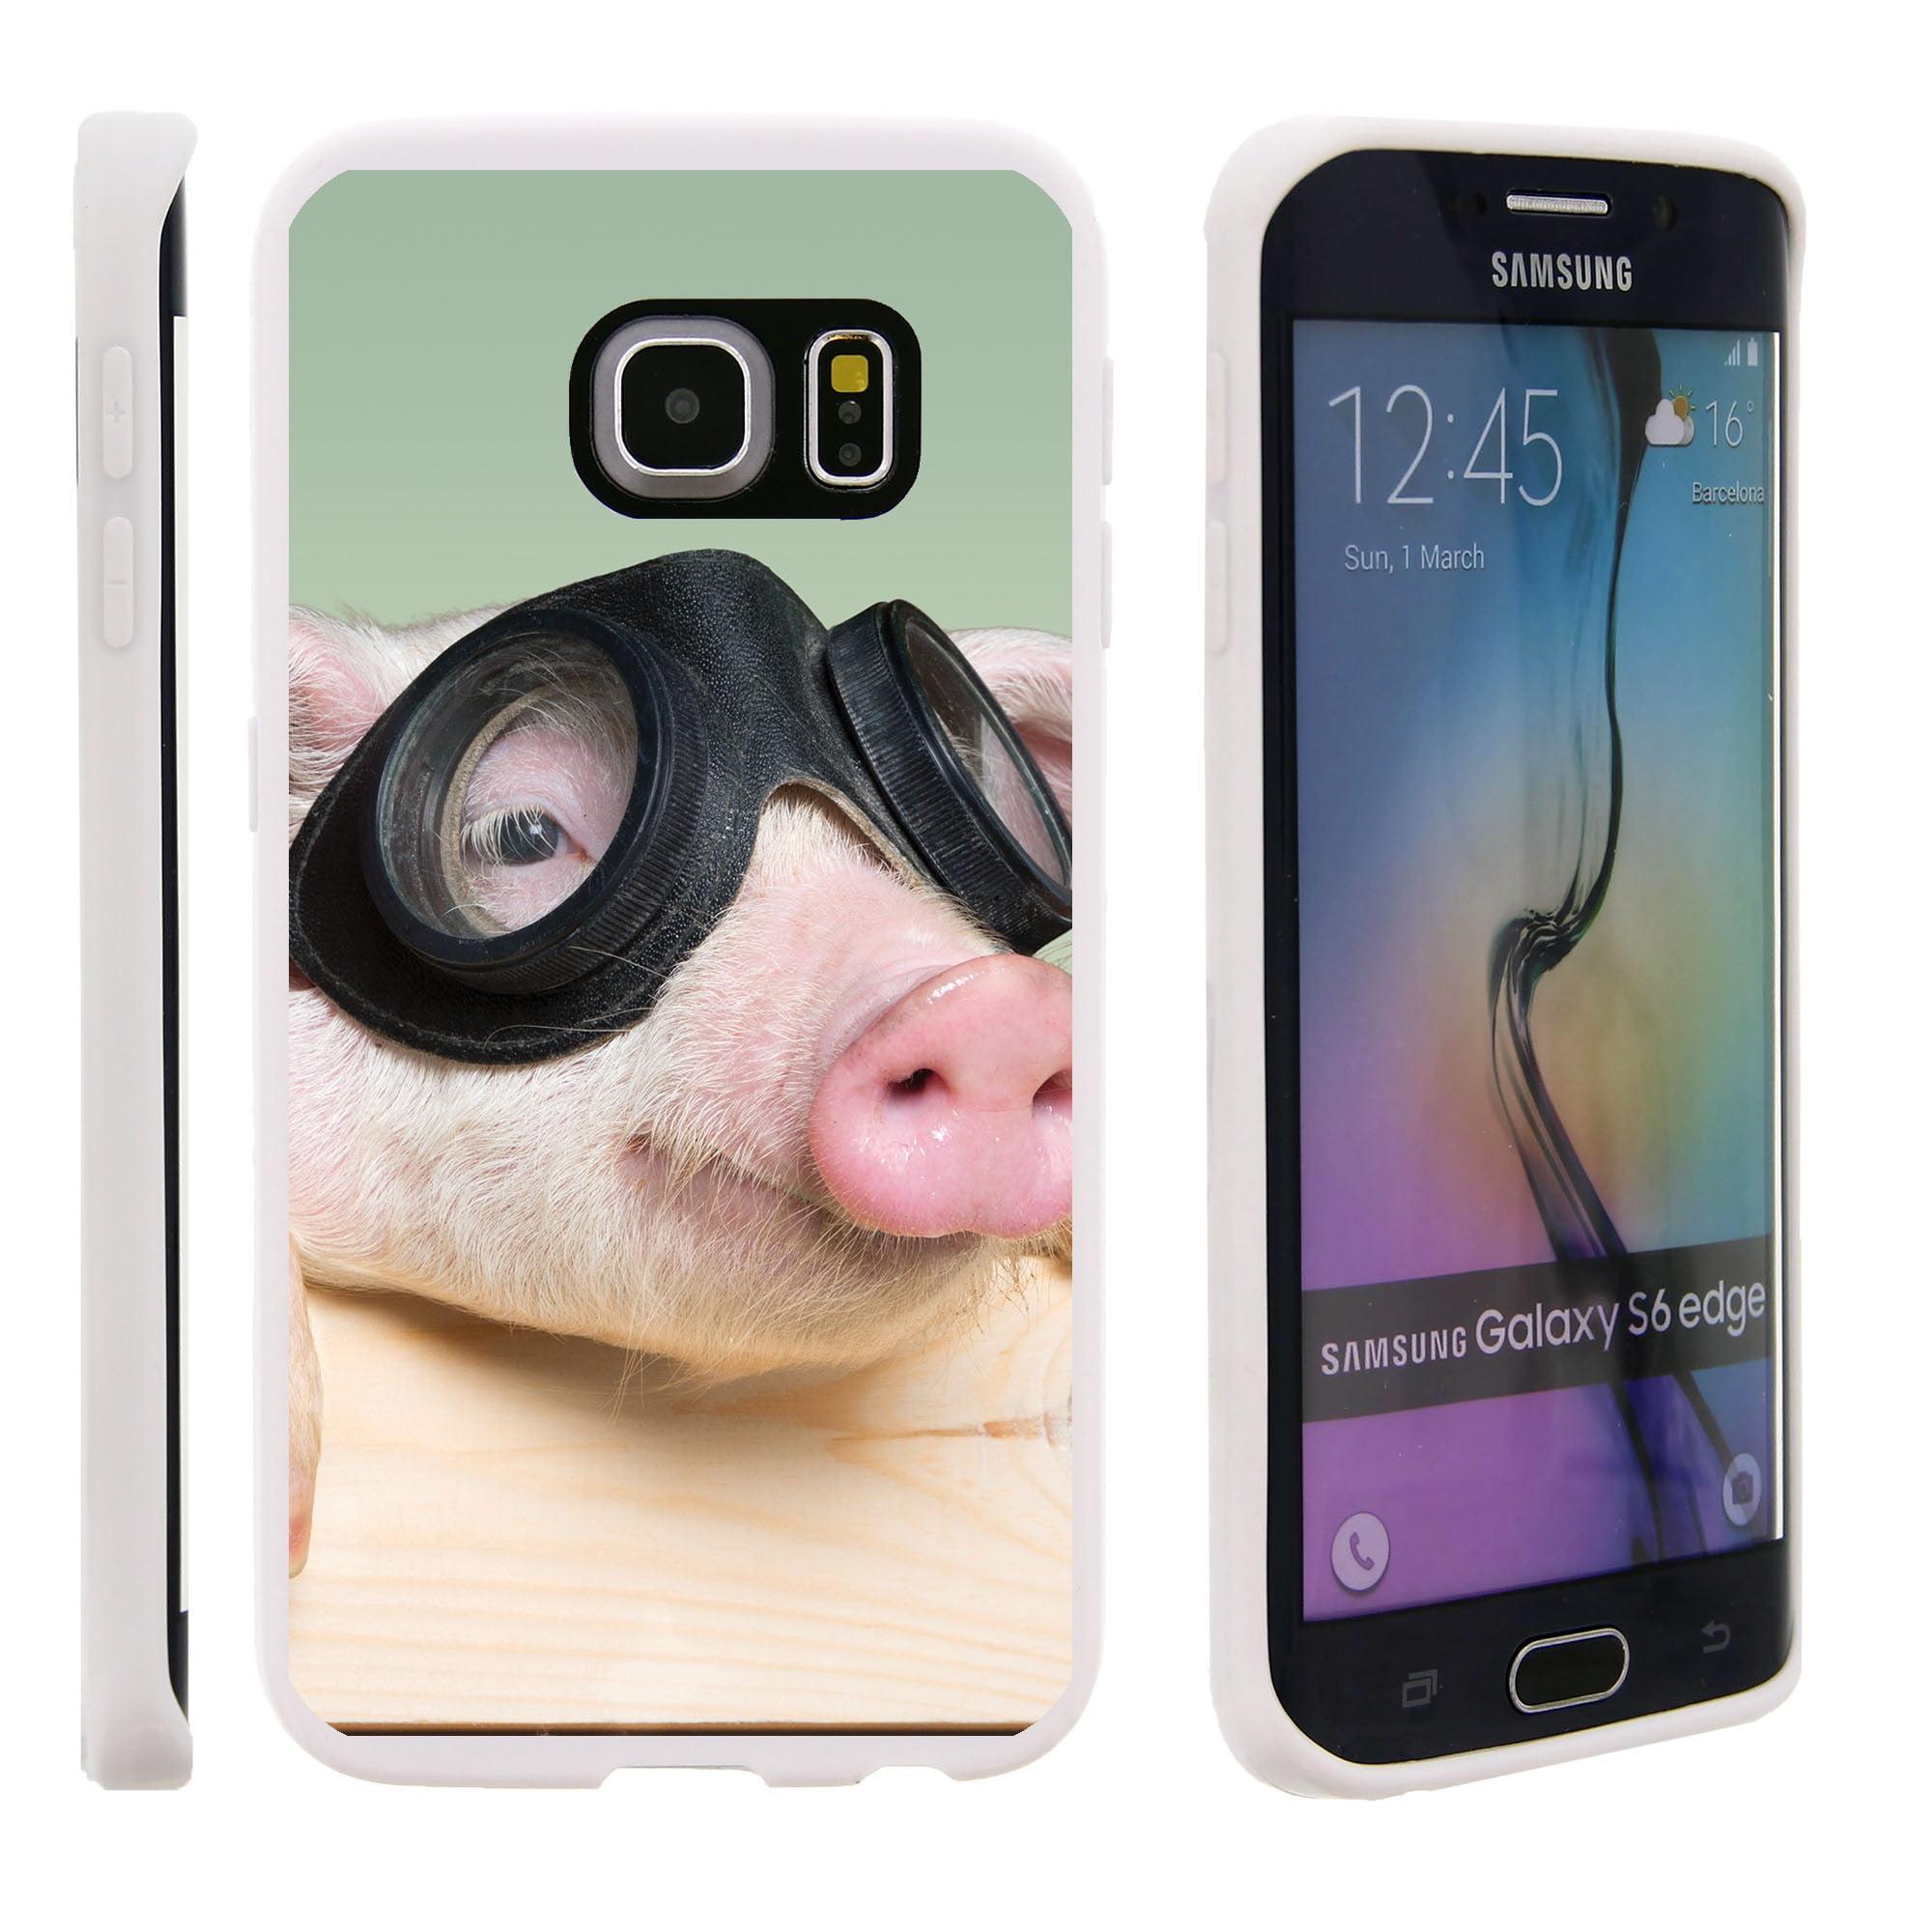 Samsung Galaxy S6 Edge G925, Flexible Case [FLEX FORCE] Slim Durable TPU Sleek Bumper with Unique Designs - Cute Pig in Goggles